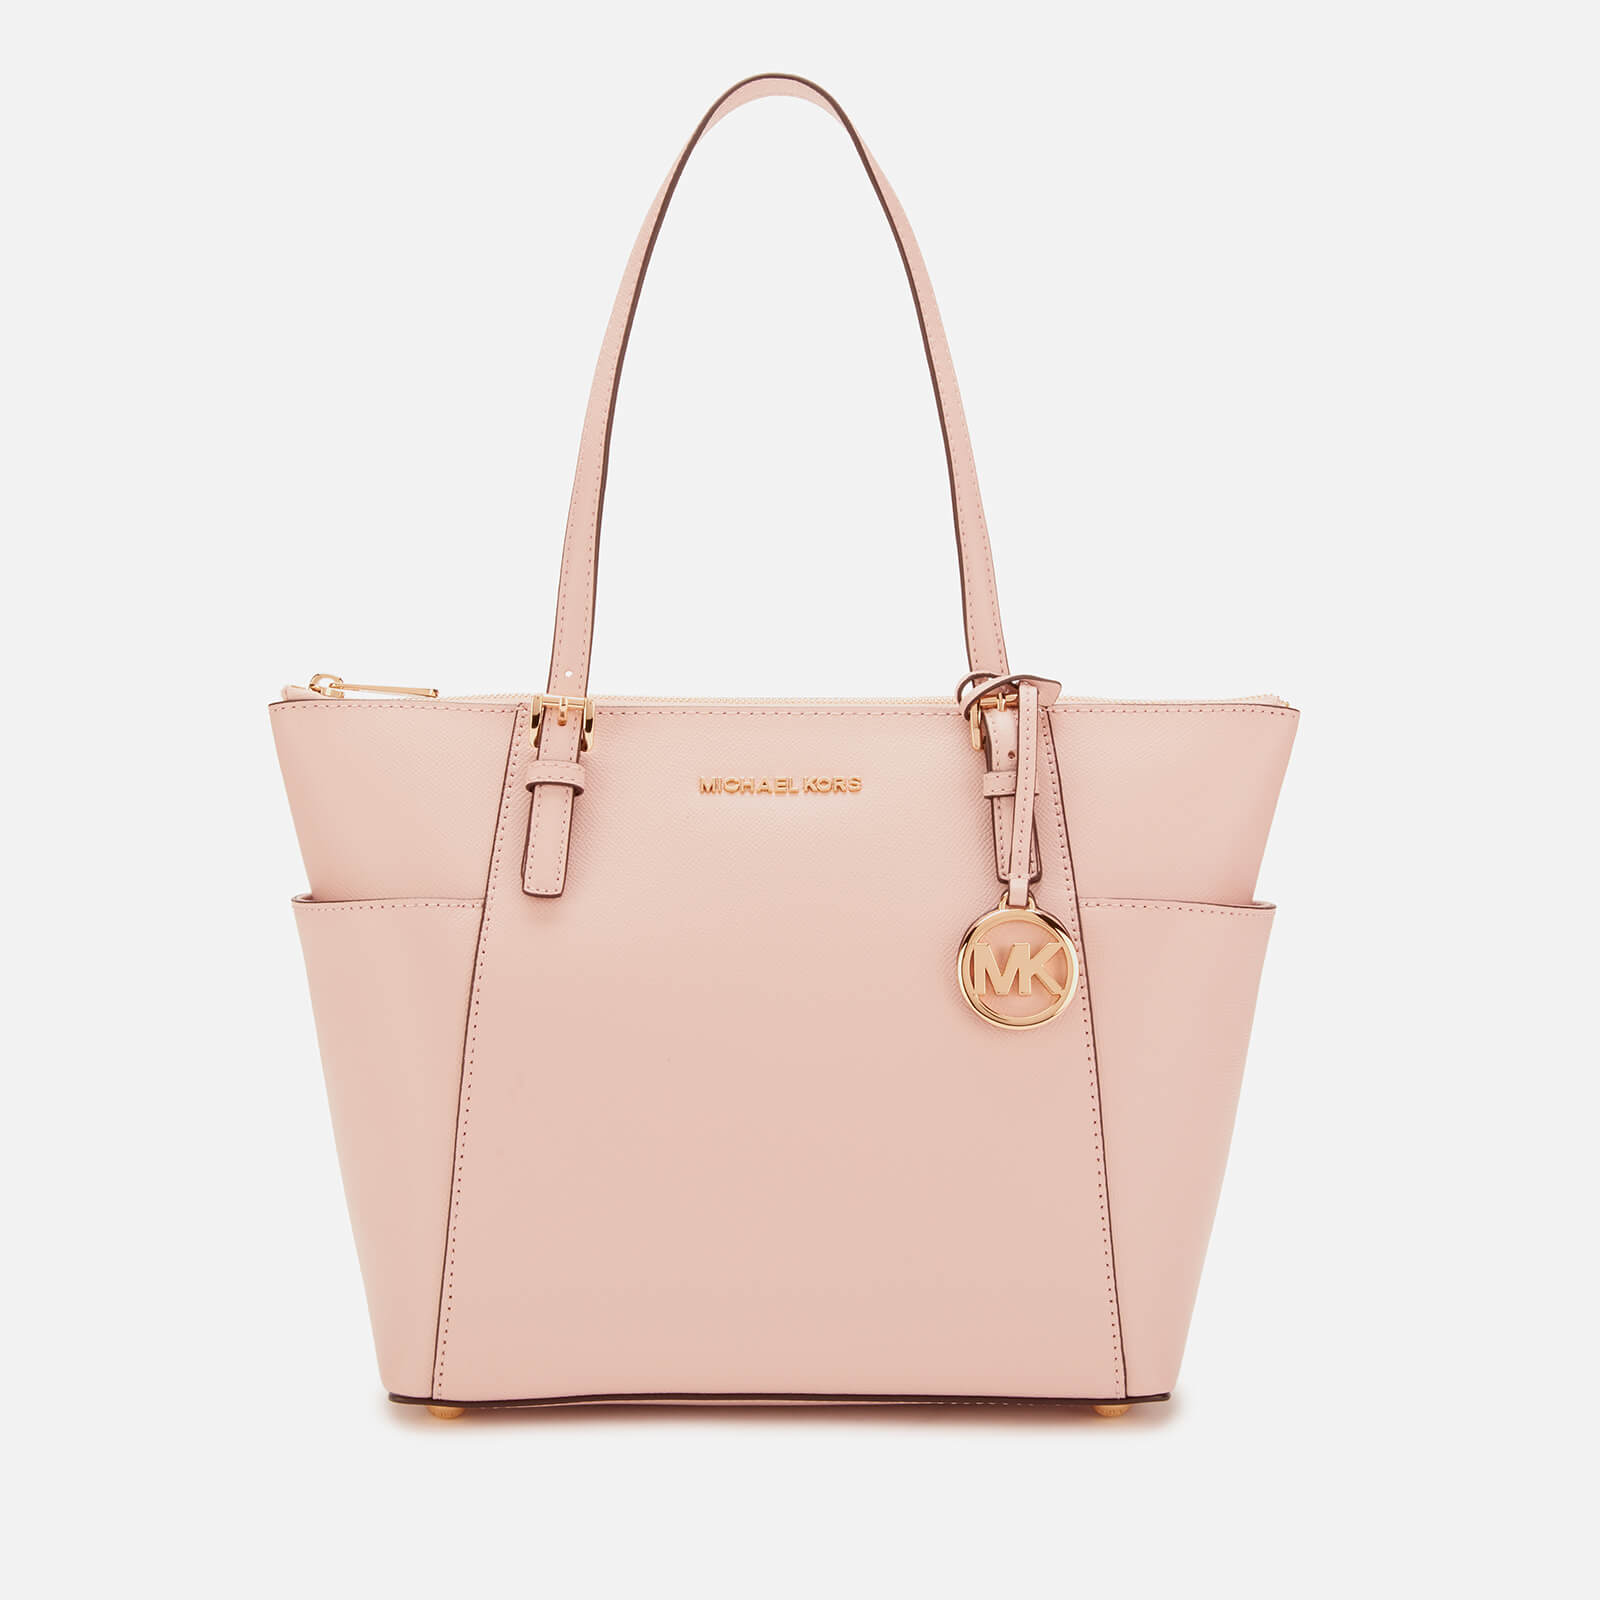 3512114a43d9 ... MICHAEL MICHAEL KORS Women's Jet Set East West Top Zip Tote Bag - Soft  Pink